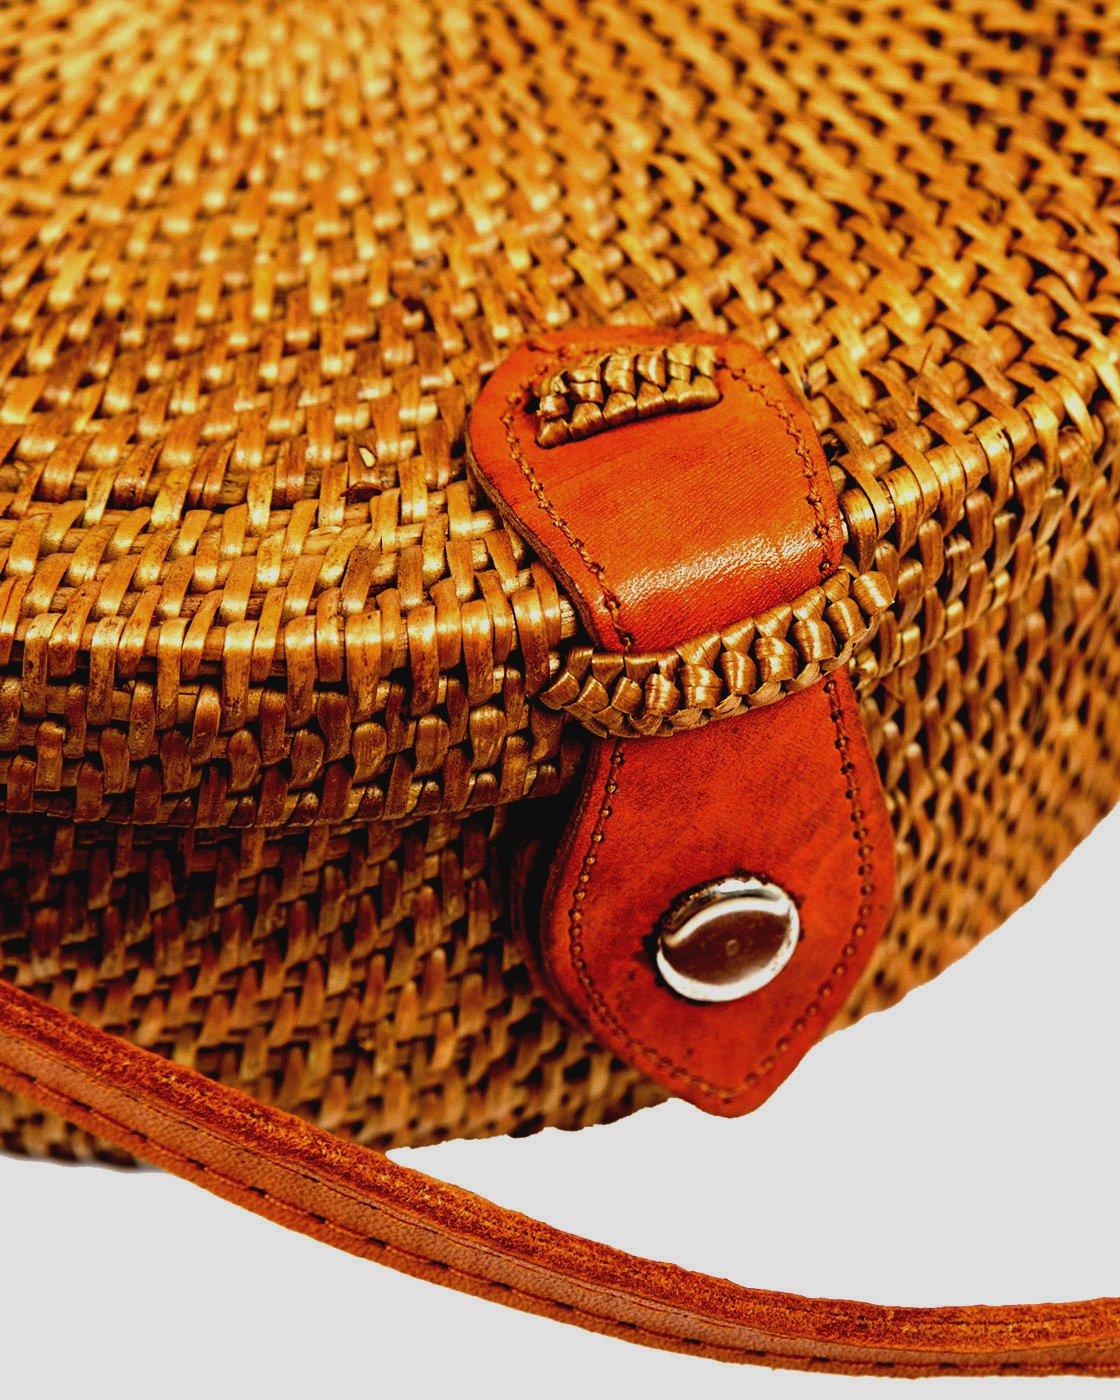 Bali Rattan - Handwoven Round Rattan Bag (Plain Weave Leather Closure) by Bali Rattan (Image #2)